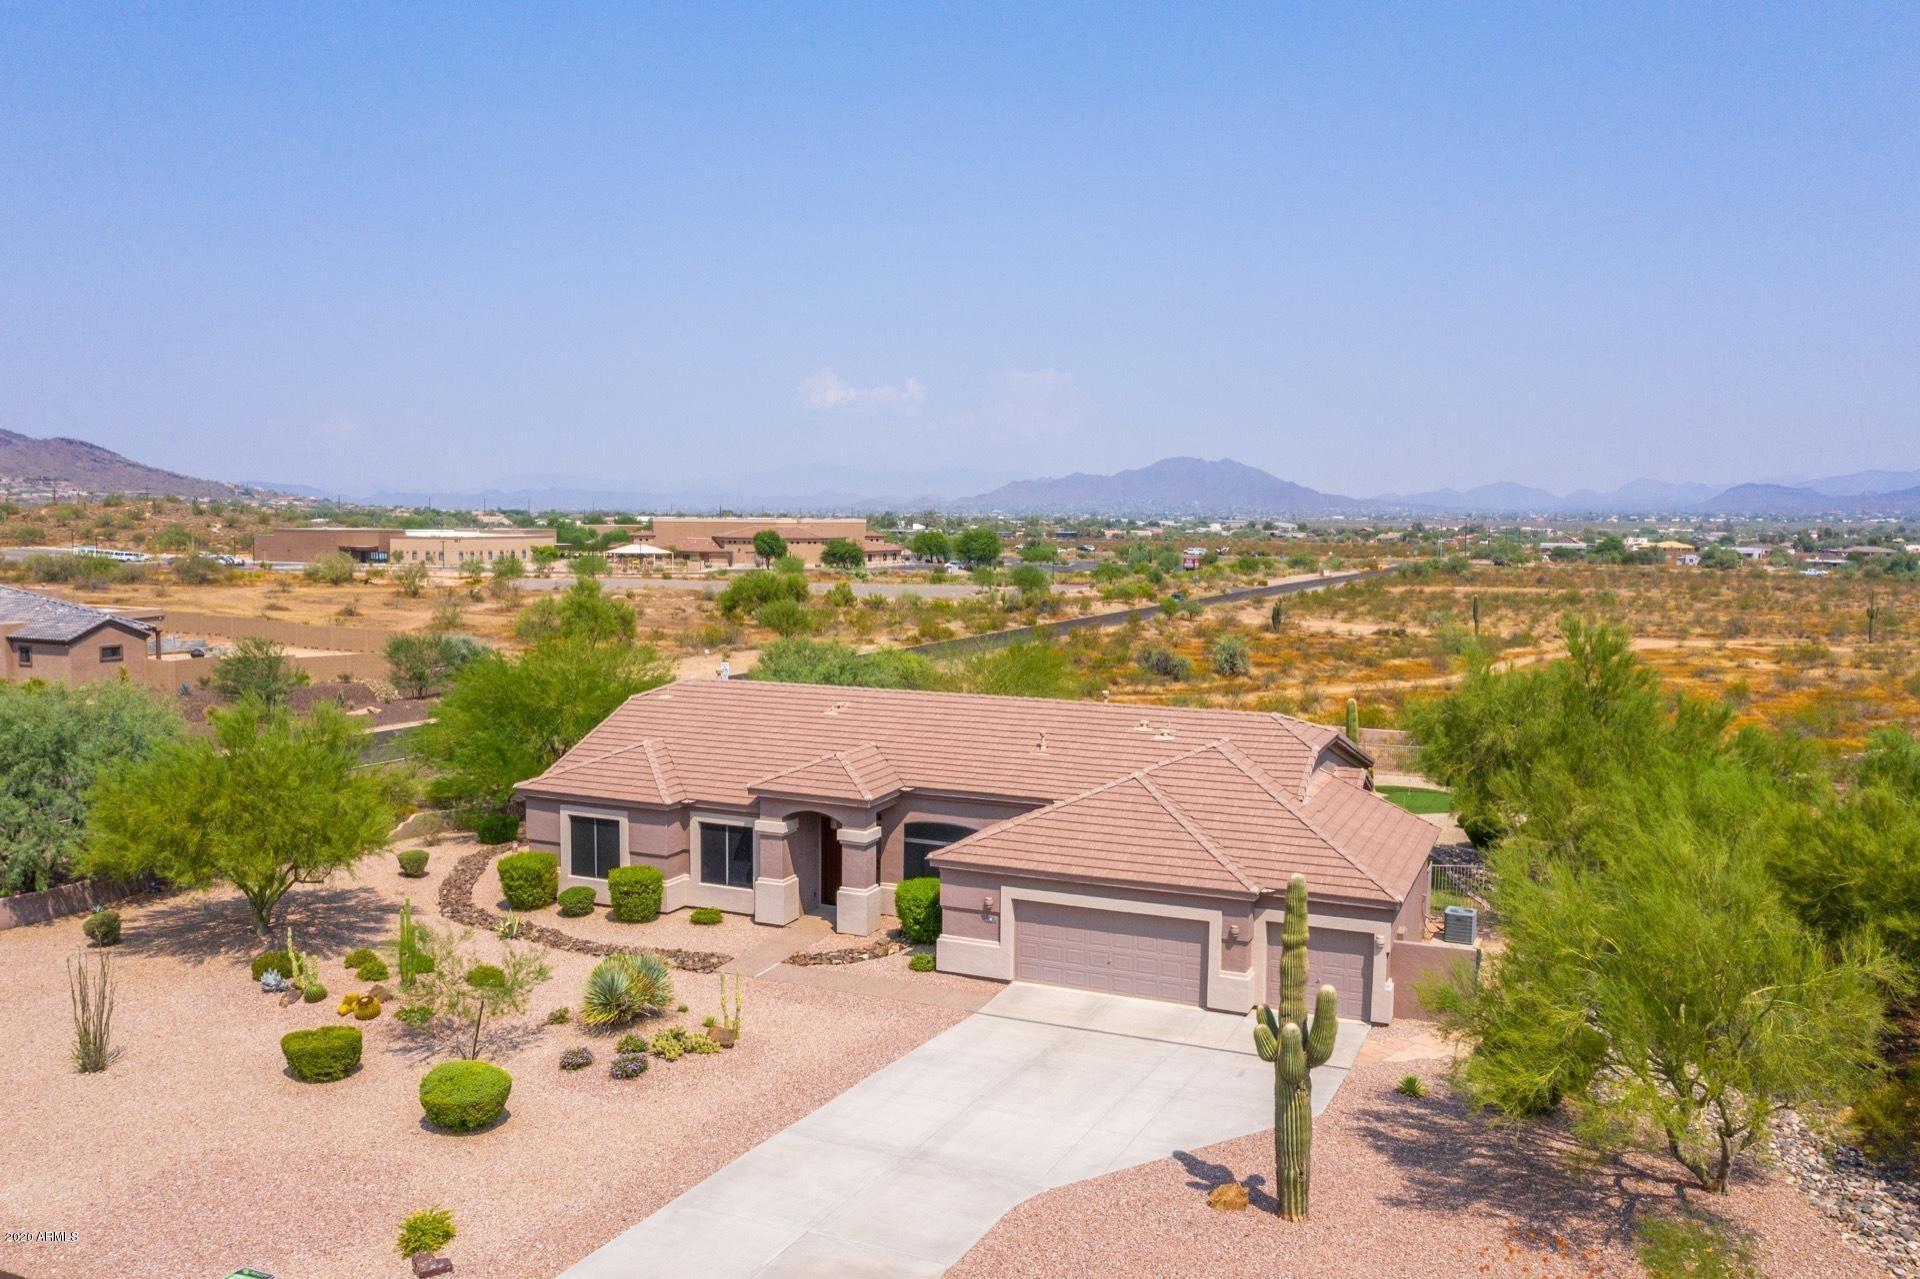 6 E SAGEBRUSH Drive, Phoenix, AZ 85085 - MLS#: 6123854